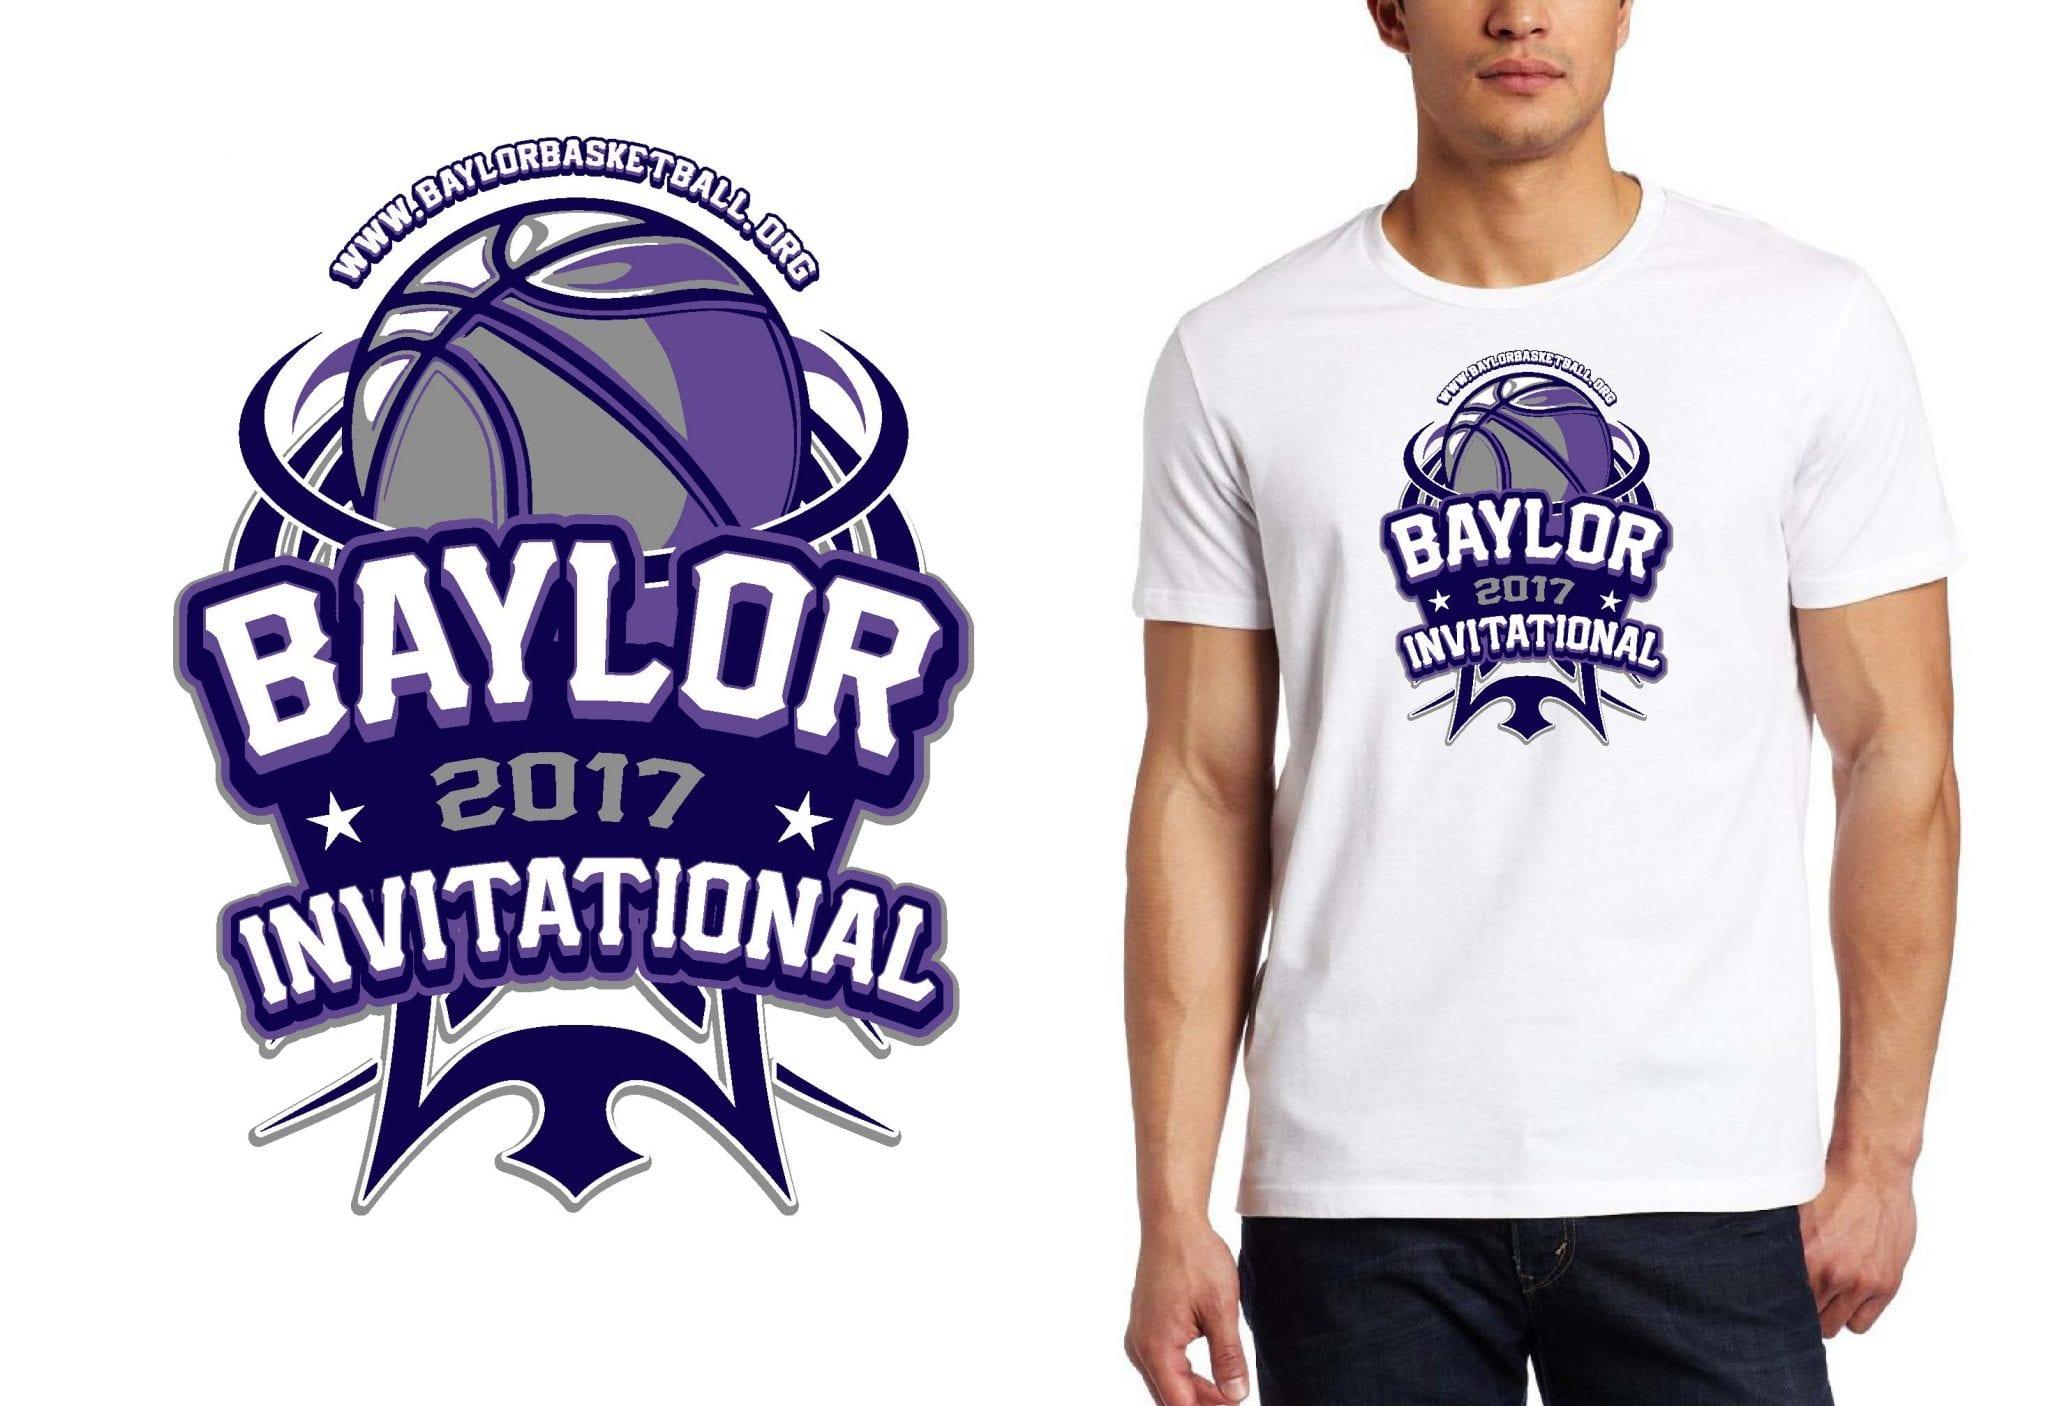 BASKETBALL TSHIRT LOGO DESIGN Baylor-Youth-Invitational BY UrArtStudio